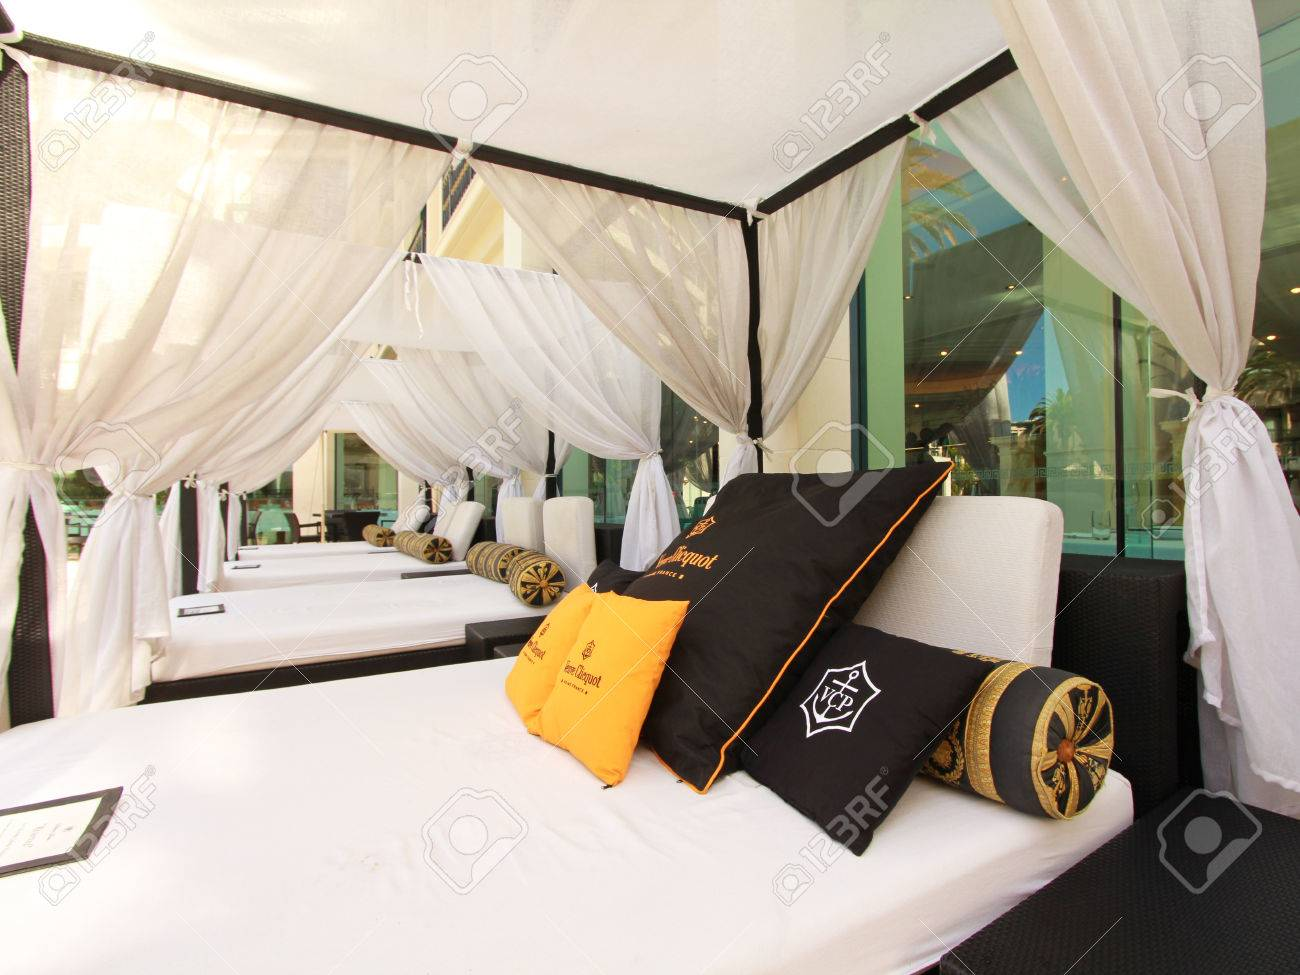 Outdoor bed cabana - Gold Coast Australia December 2 2012 Outdoor Bed In A Cabana Beside A